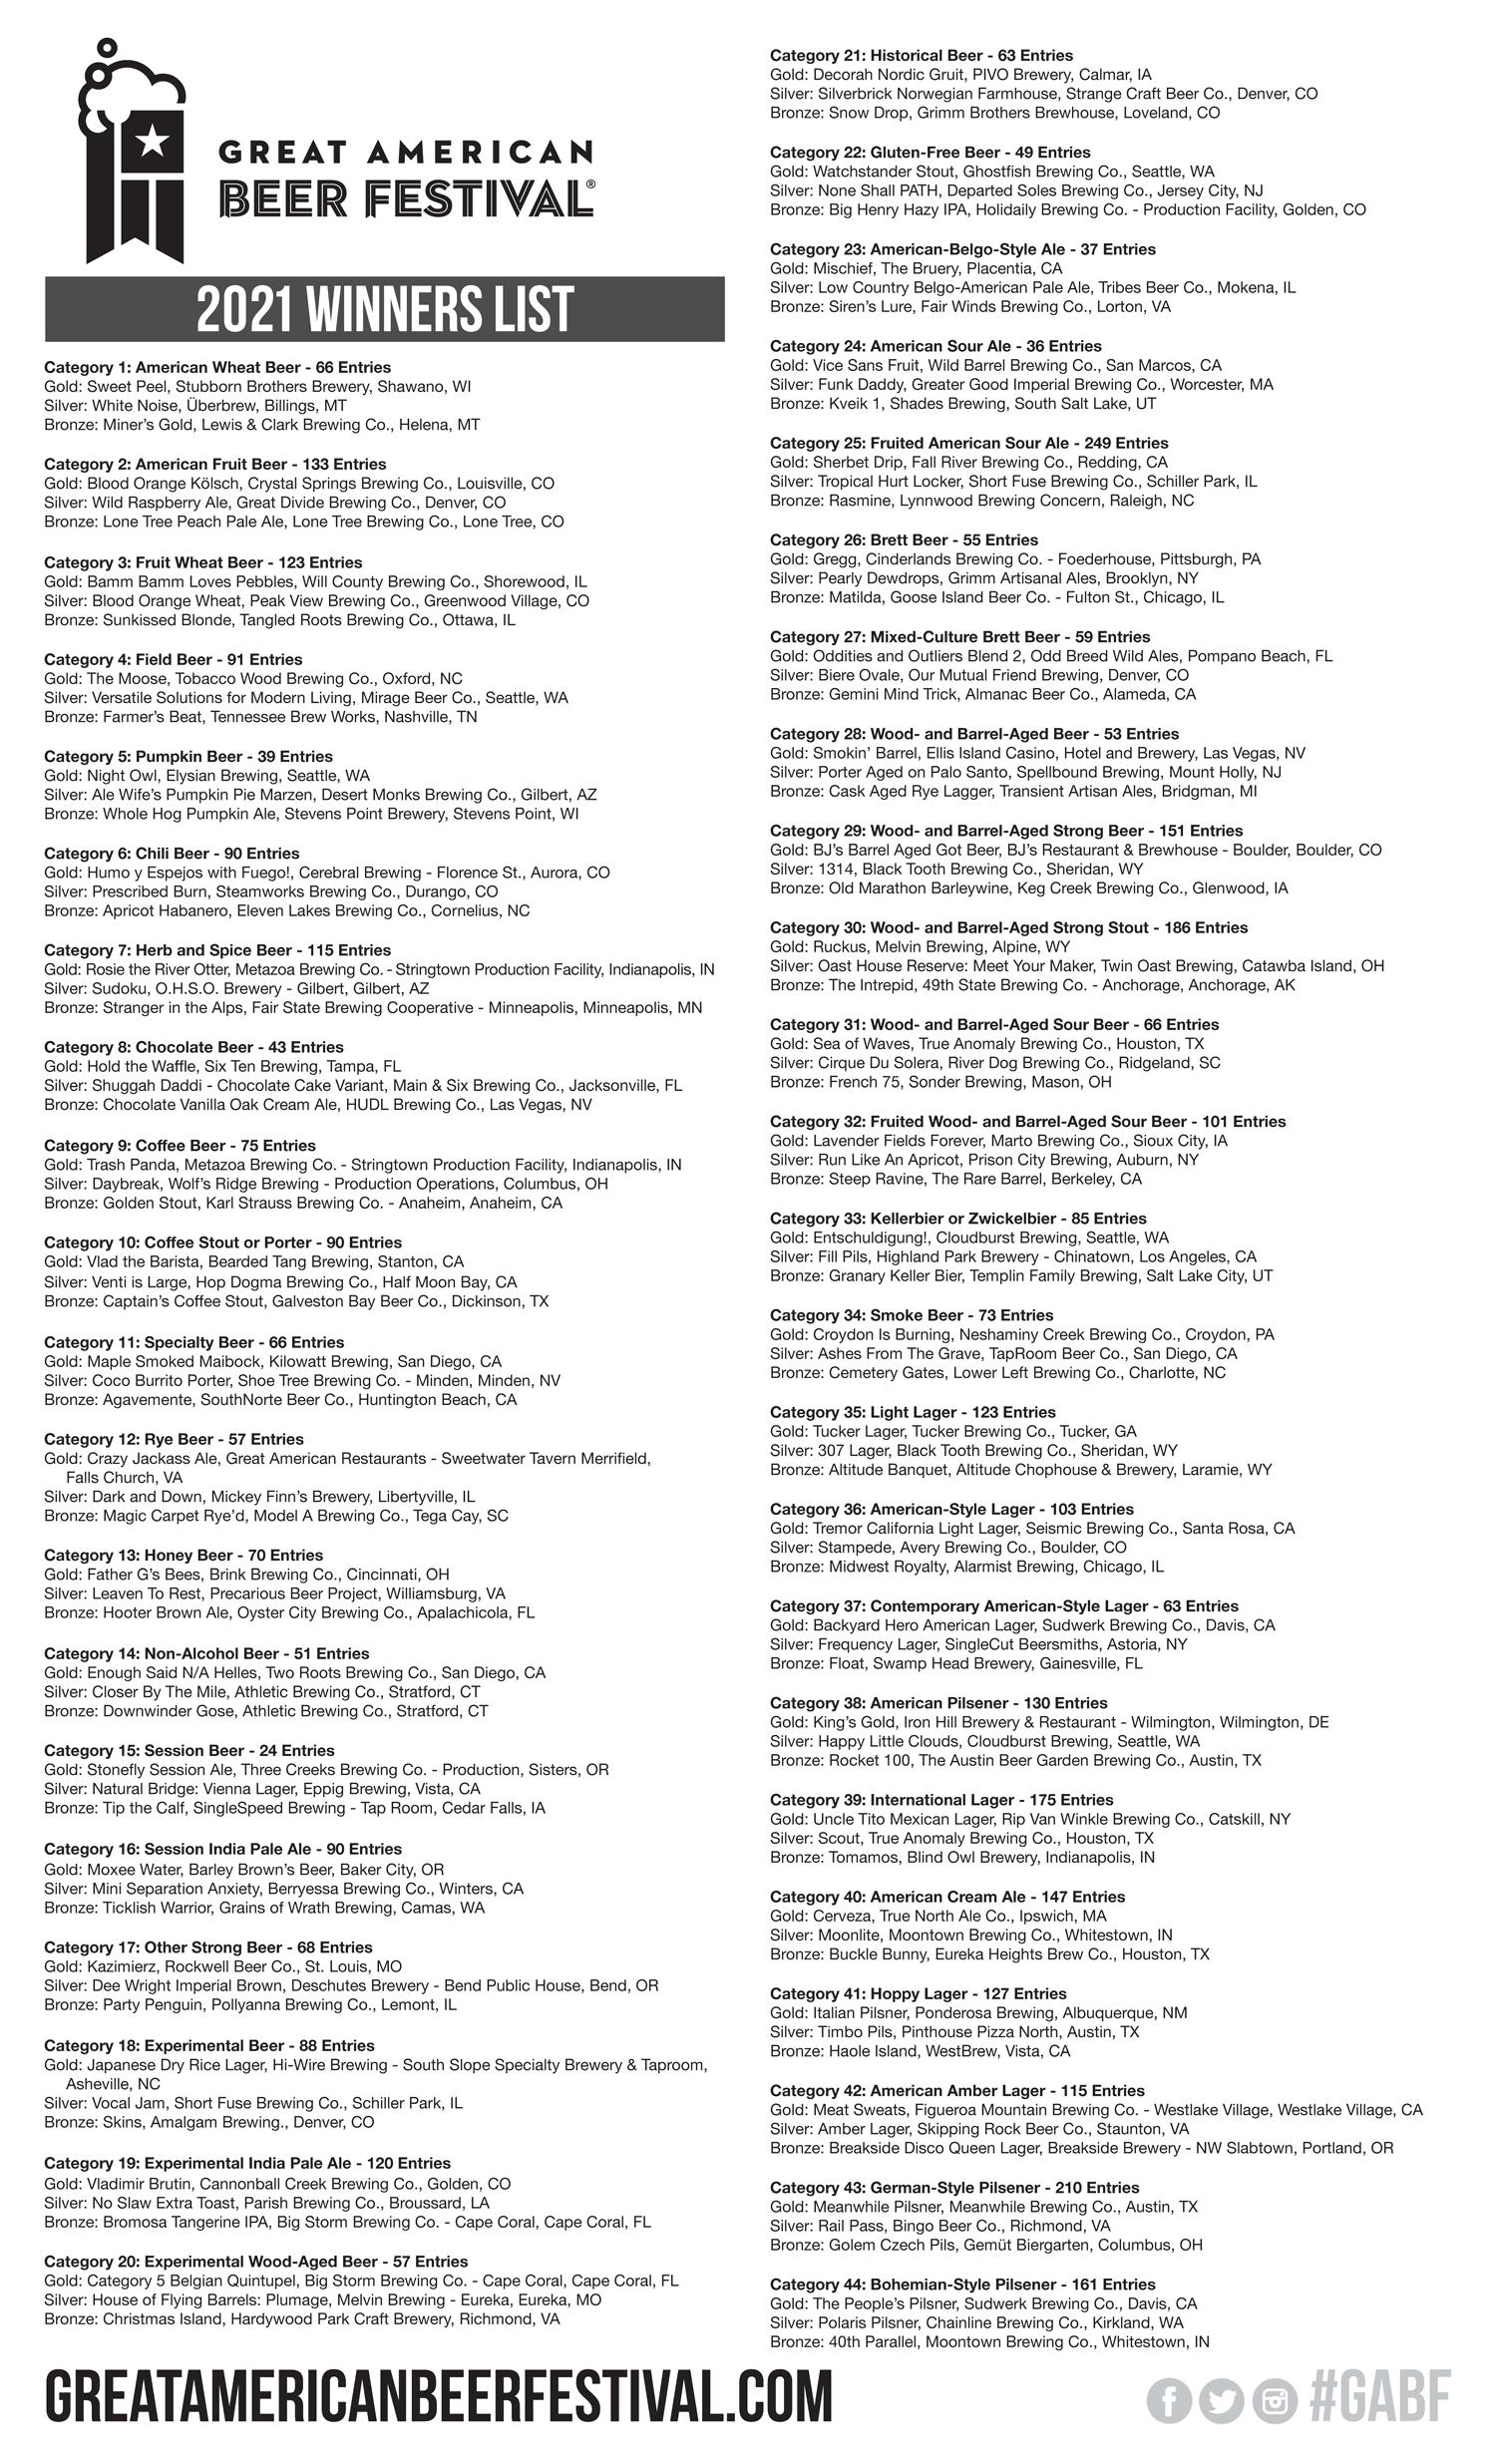 GABF 2021 Winners Page 1